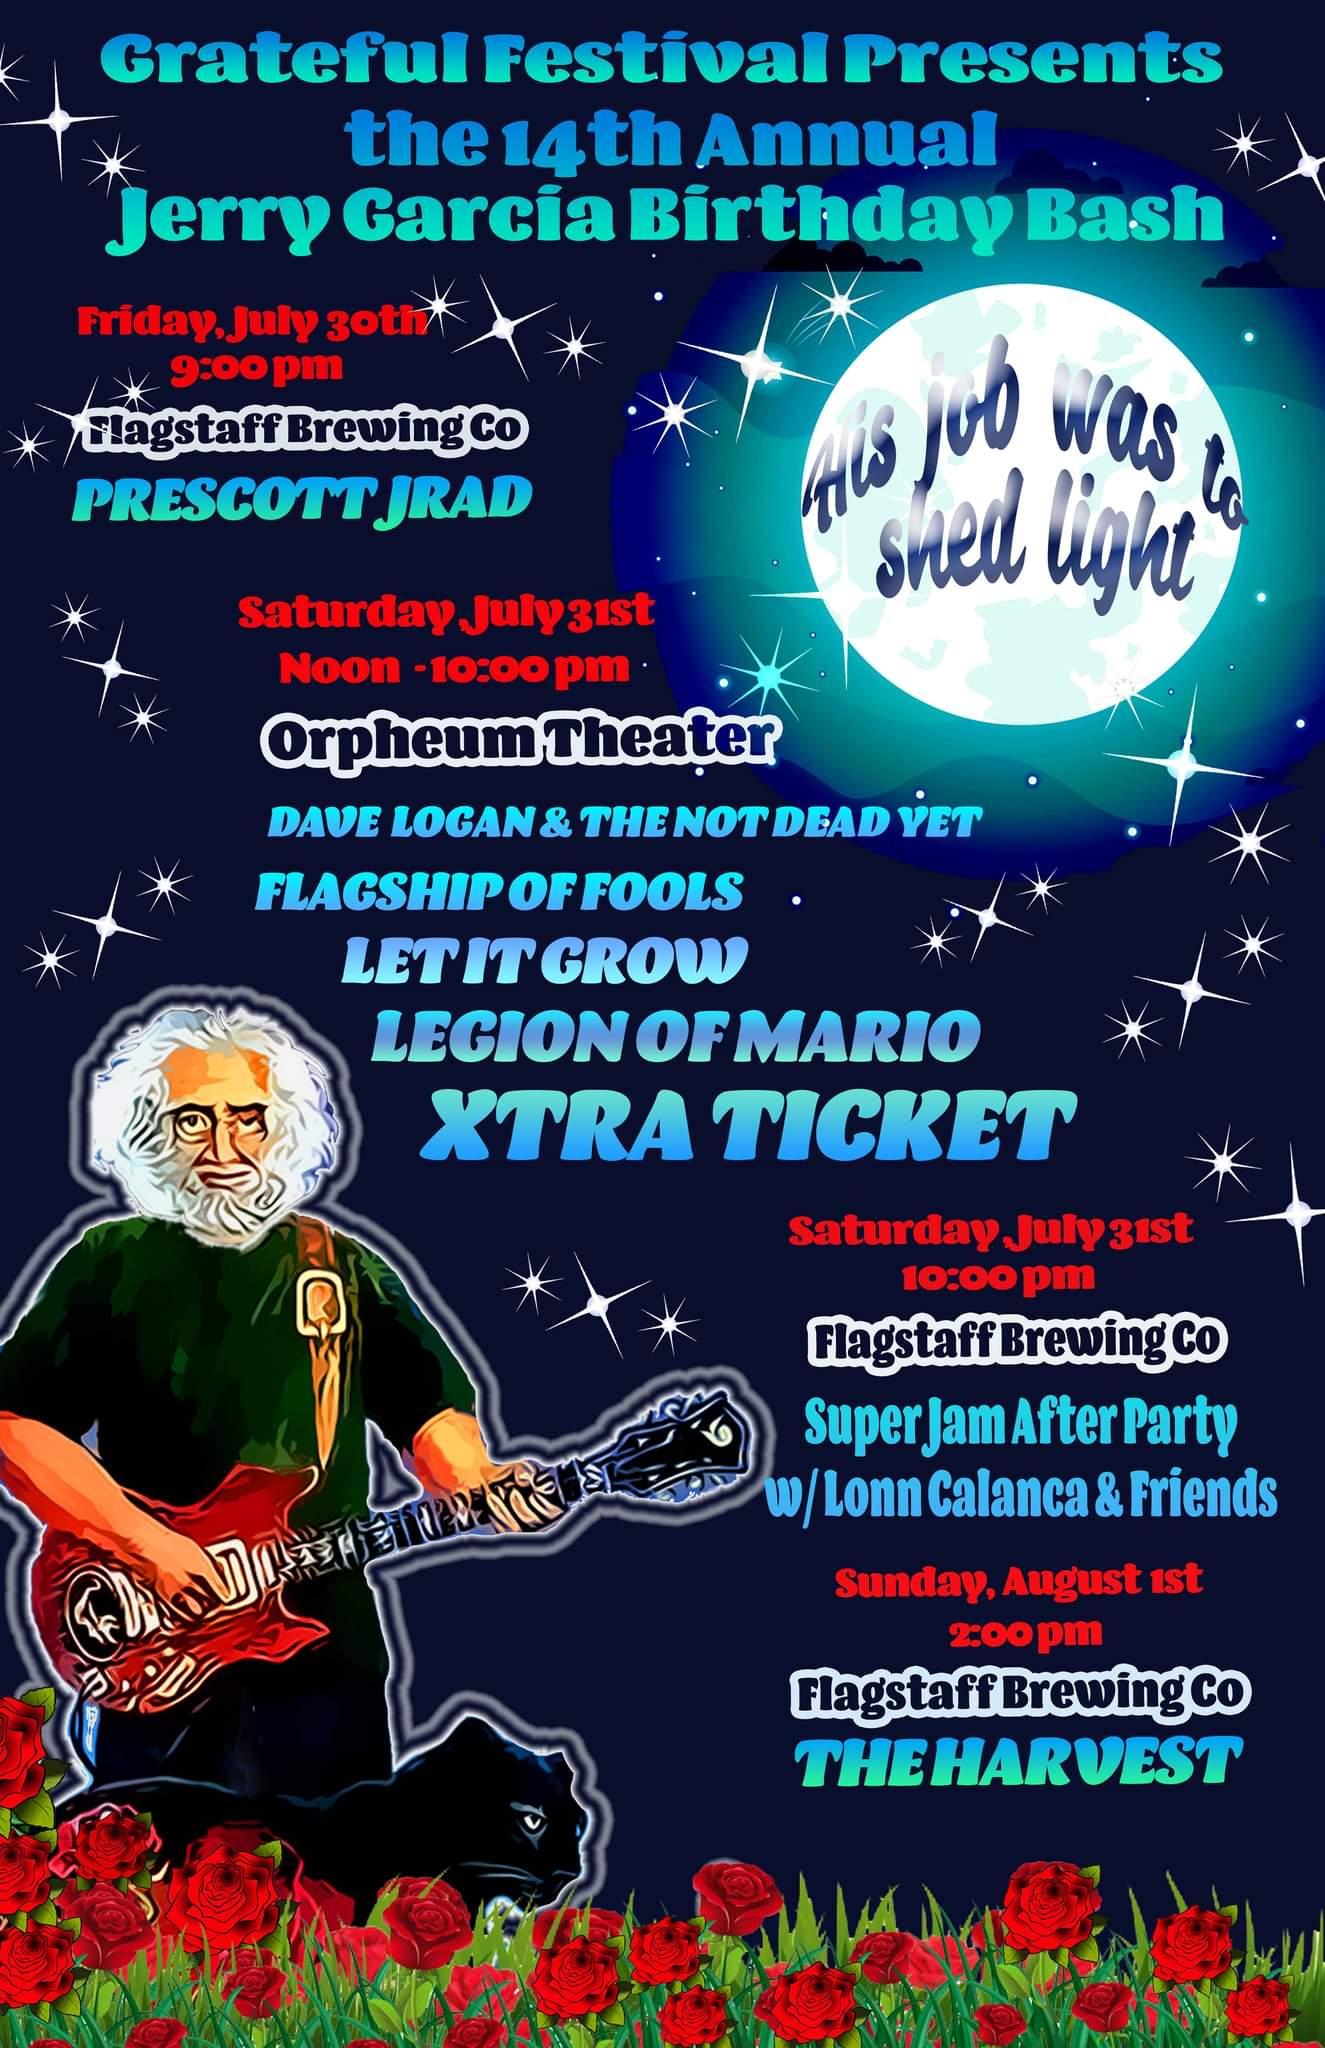 The 14th Annual Jerry Garcia Birthday Bash: